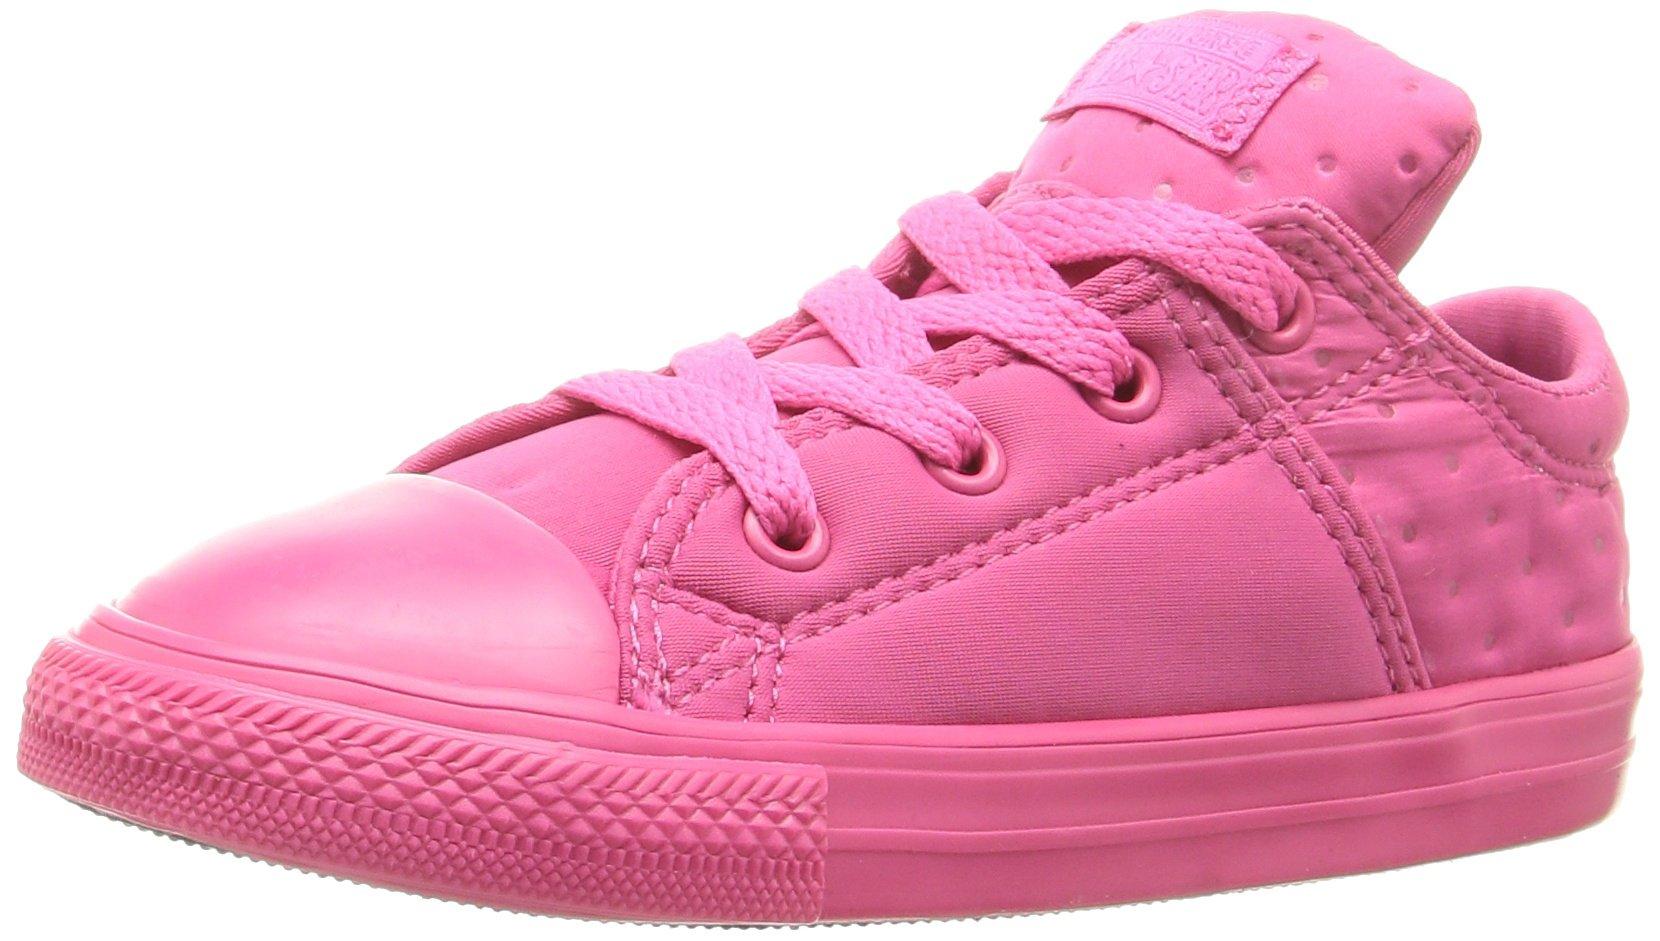 50b5beddee5c Galleon - Converse Kids Girls  Chuck Taylor All Star Madison Ox (Infant  Toddler)